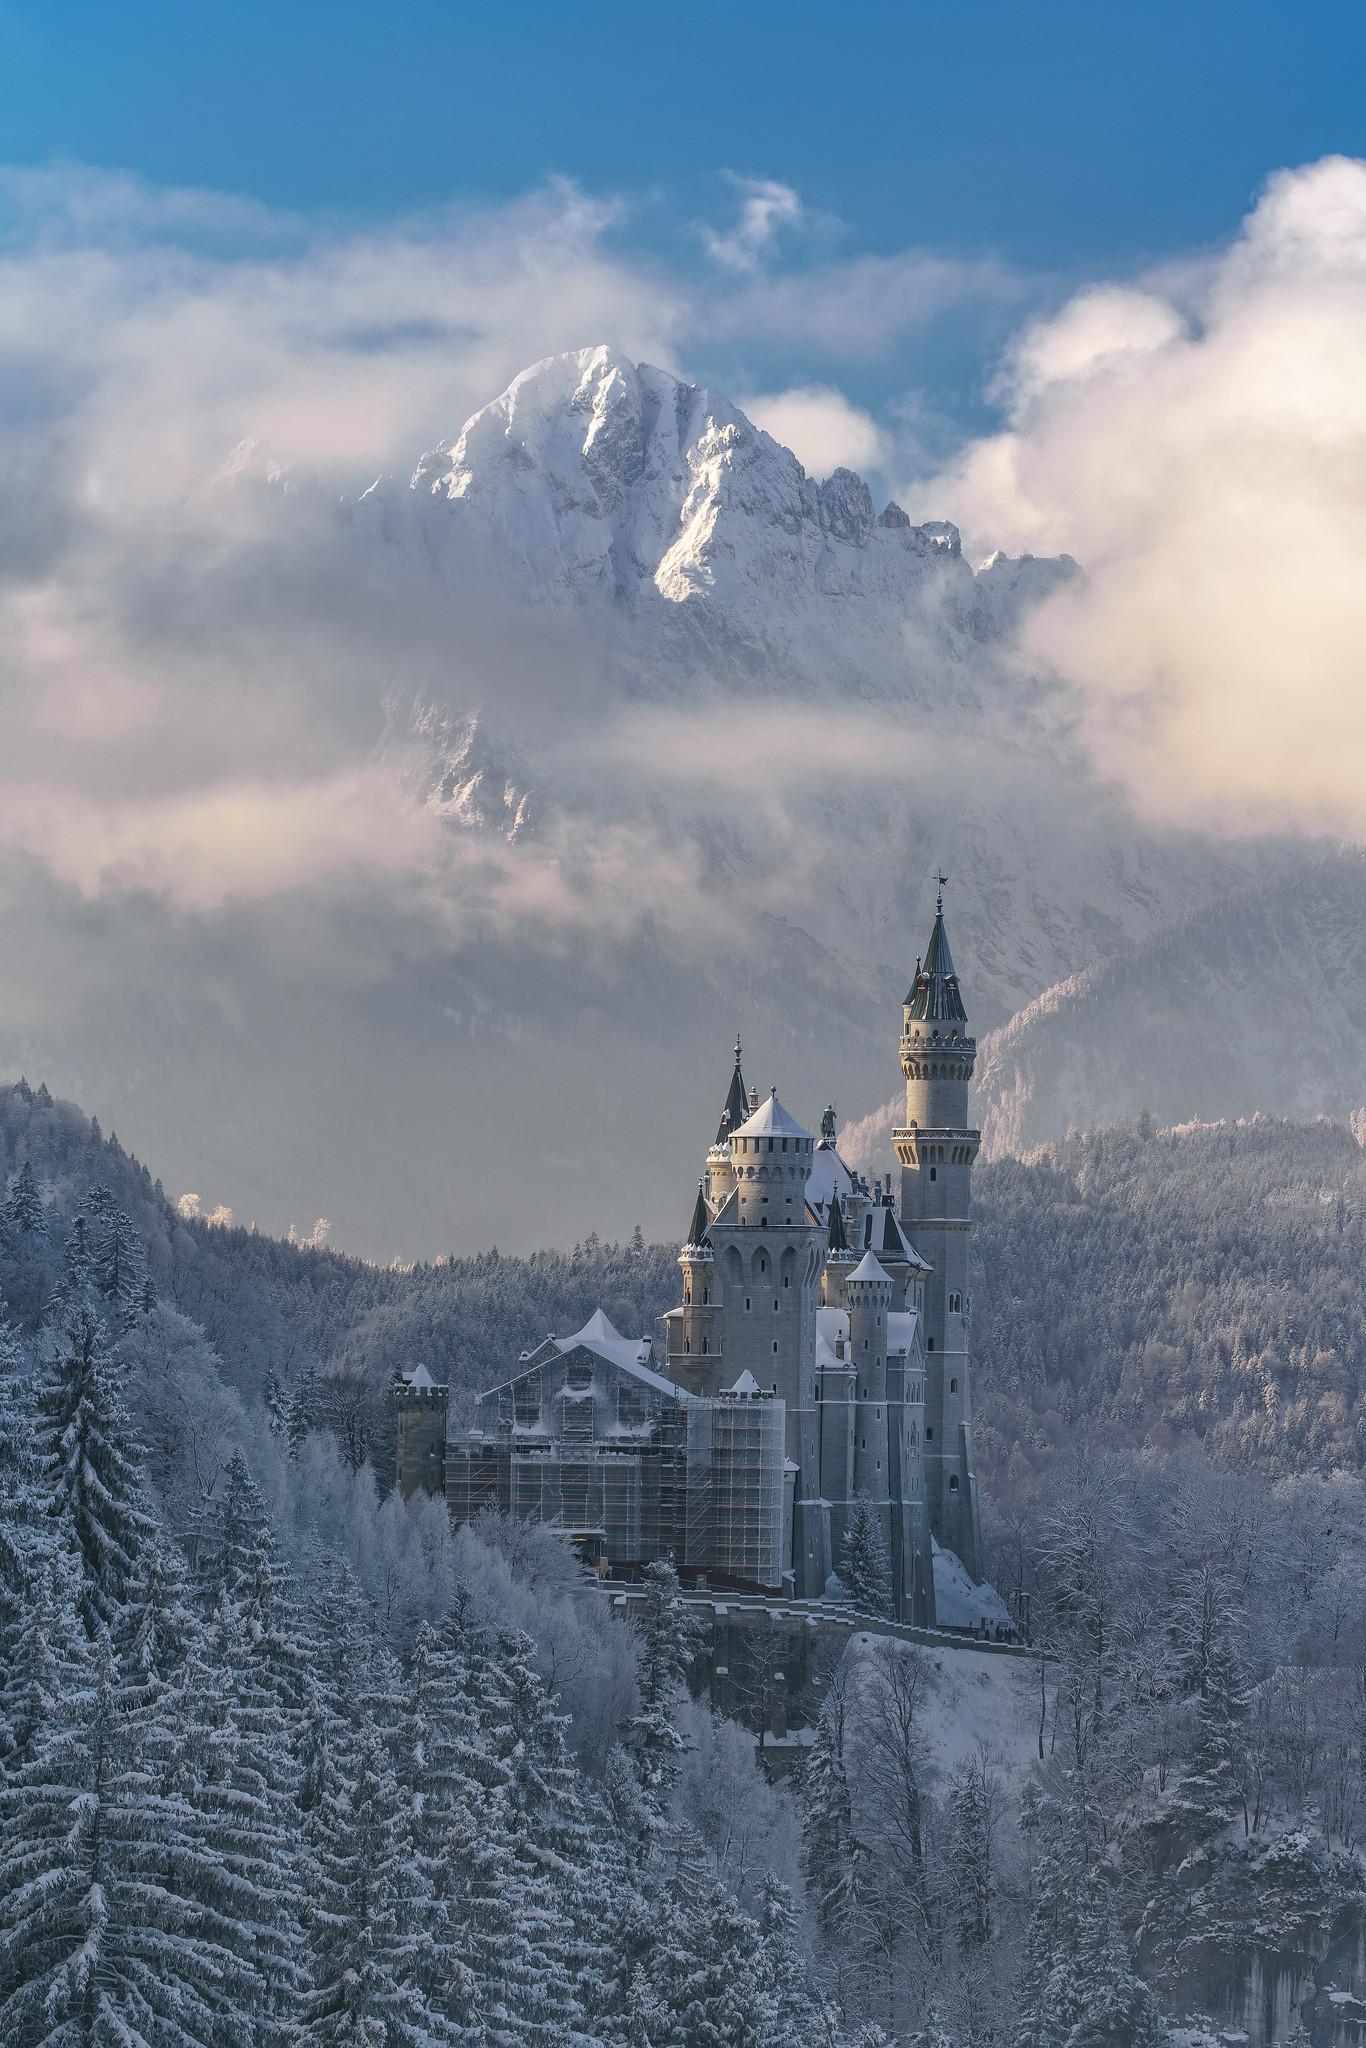 Winter Fairytale - Flickr Top25 2017 -